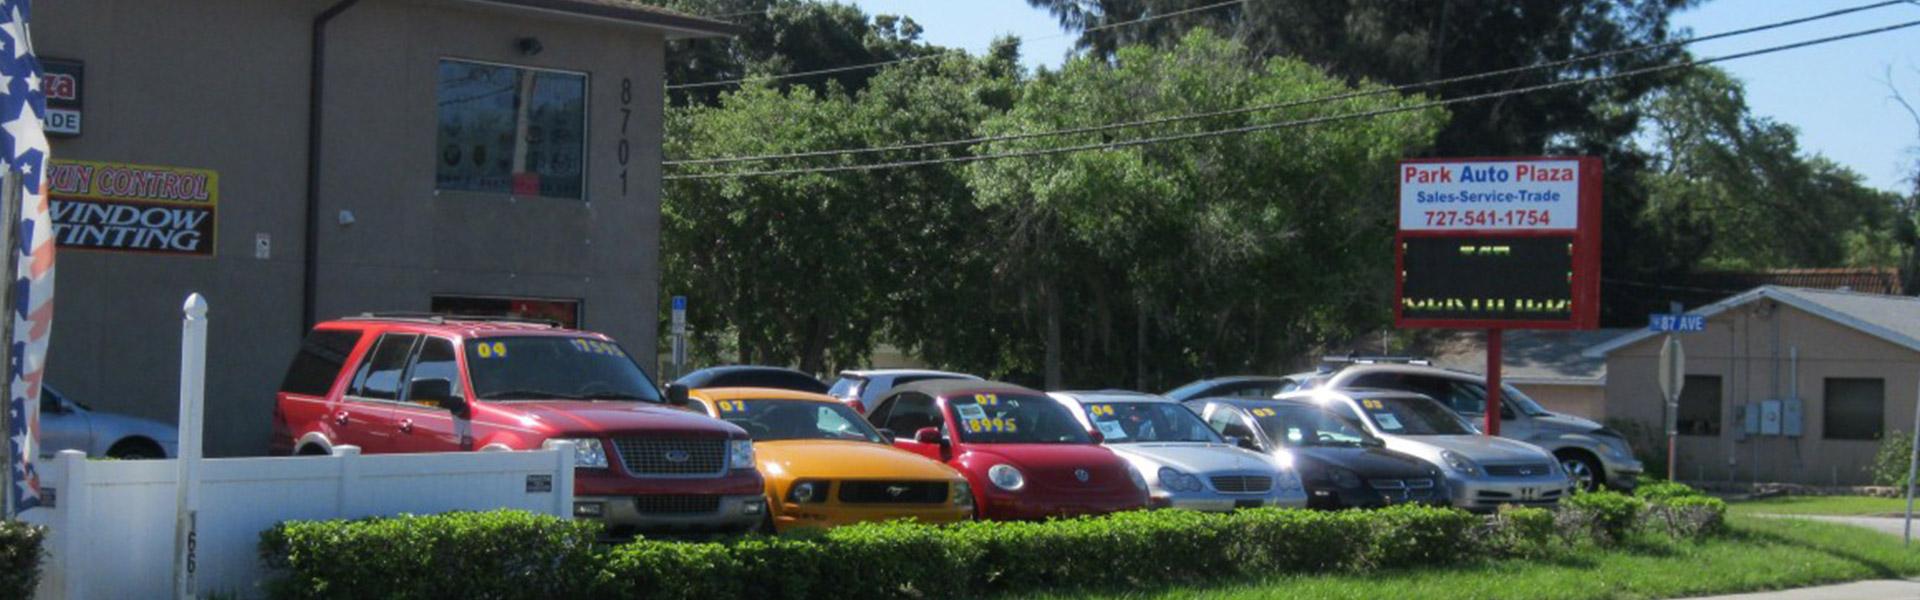 park-auto-plaza-slide